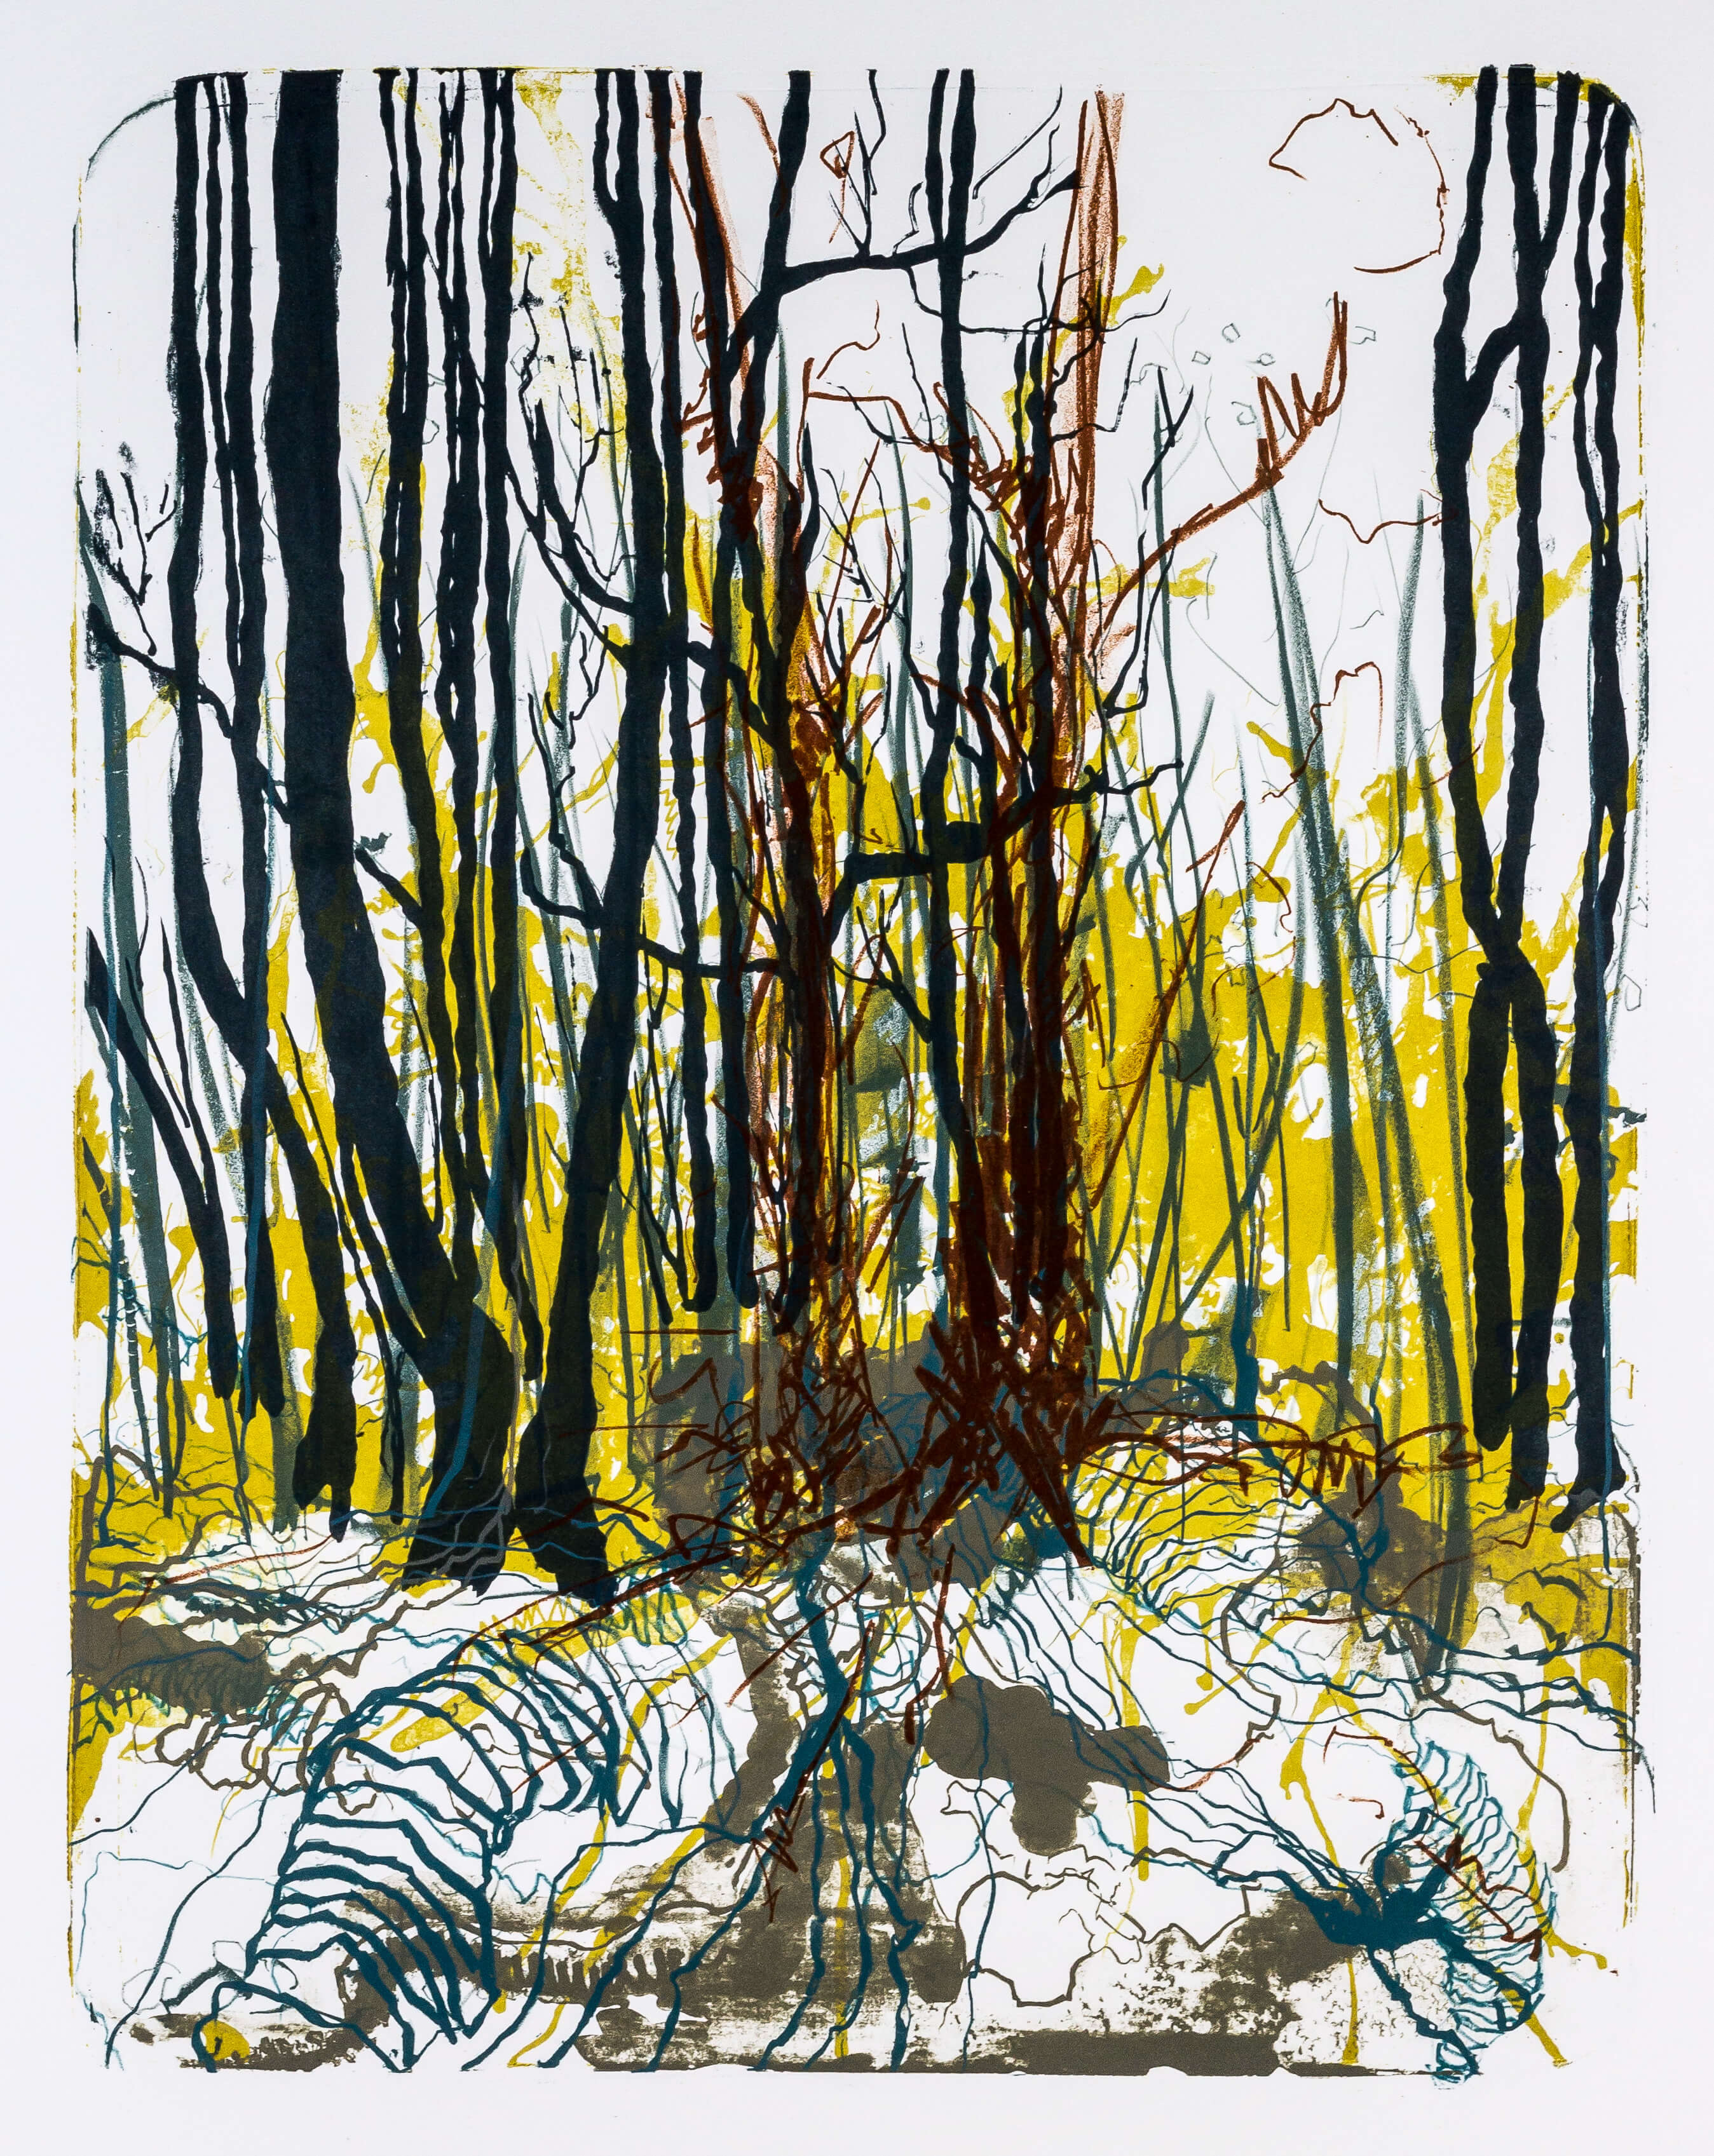 Katharina Albers, Wald X-XXII, 2015, Farblithographie, Unikat, 50×40 cm